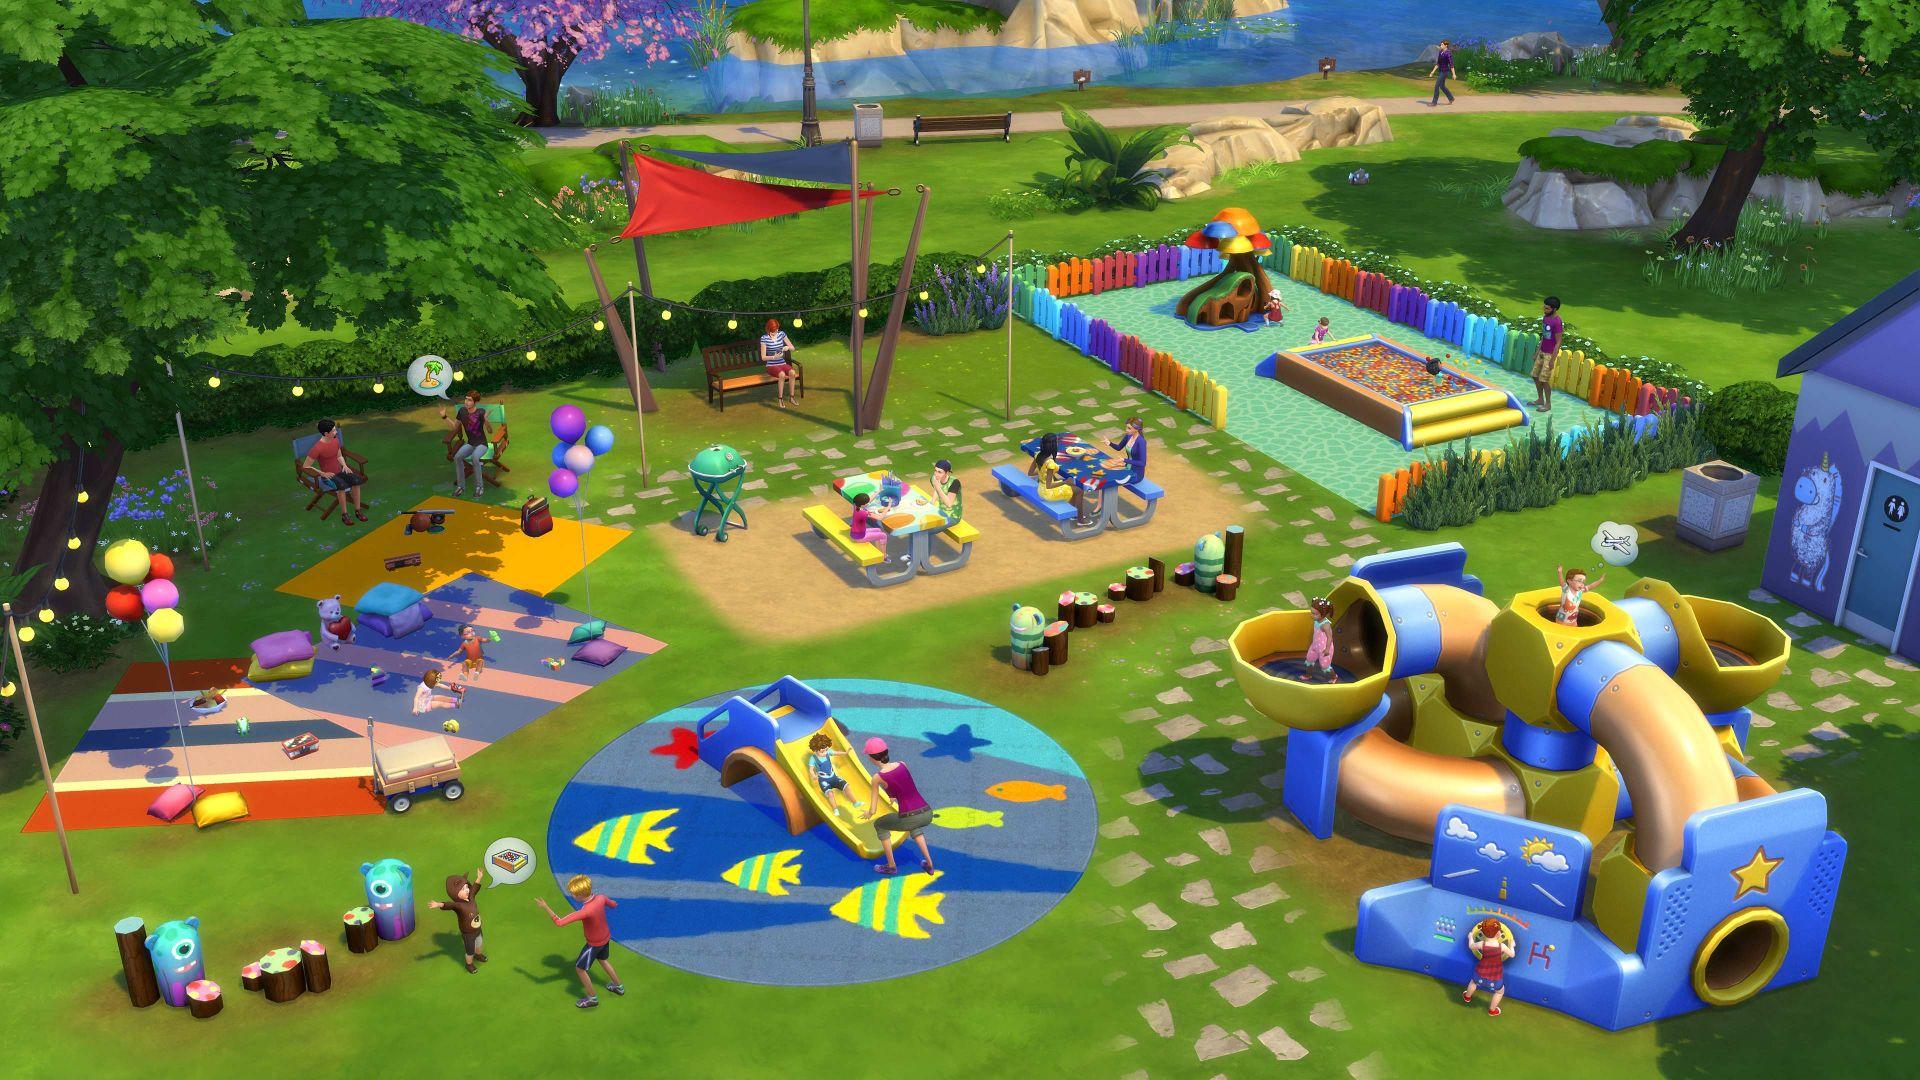 Výsledek obrázku pro the sims 4 toddler stuff